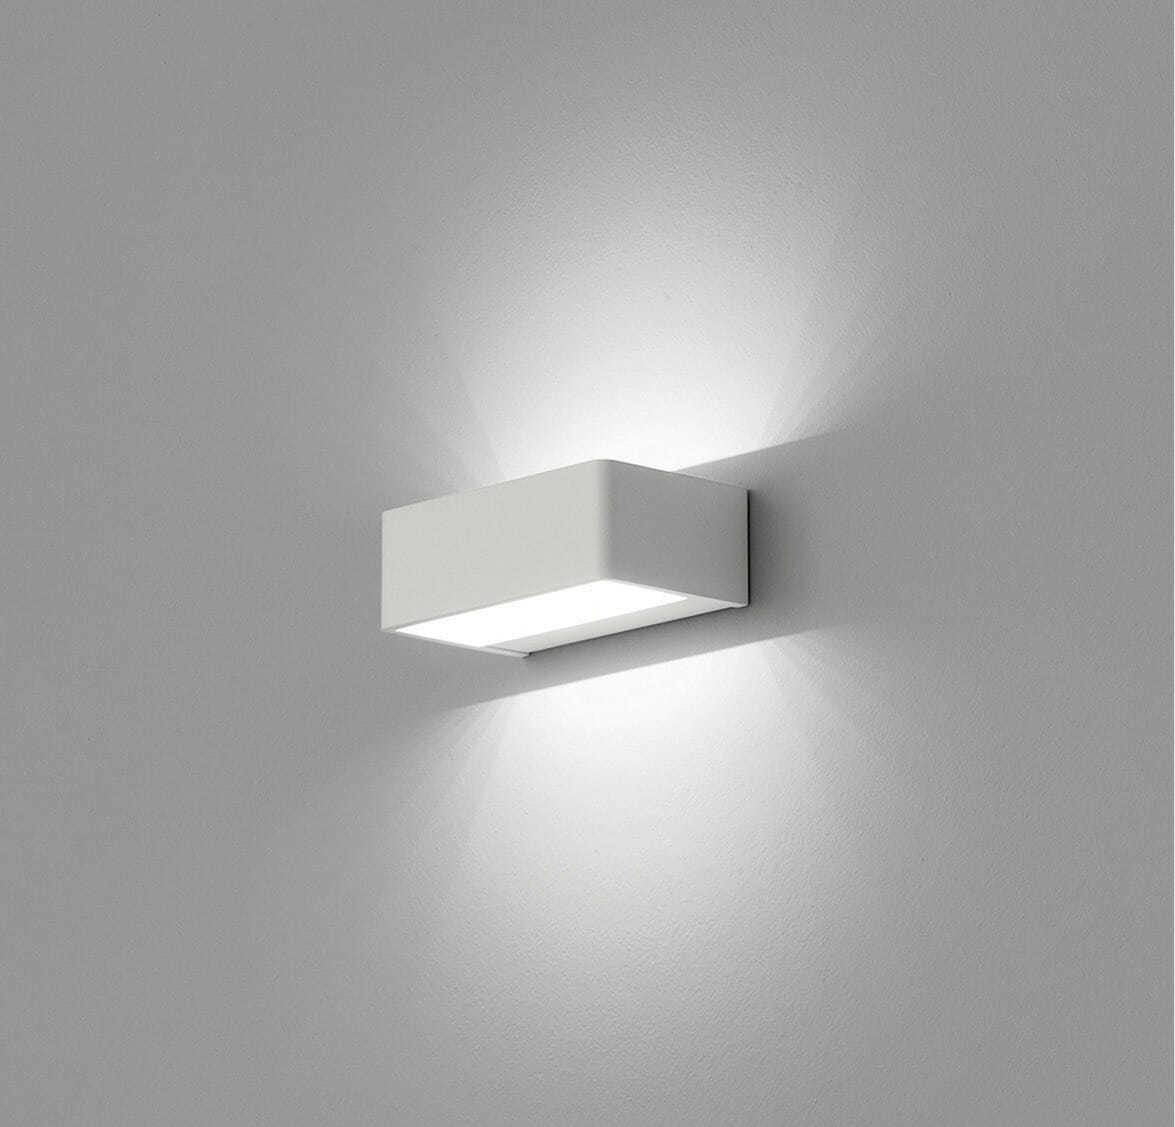 Lampada led parete maya 11 watt 3000k - Lampade da parete design ...